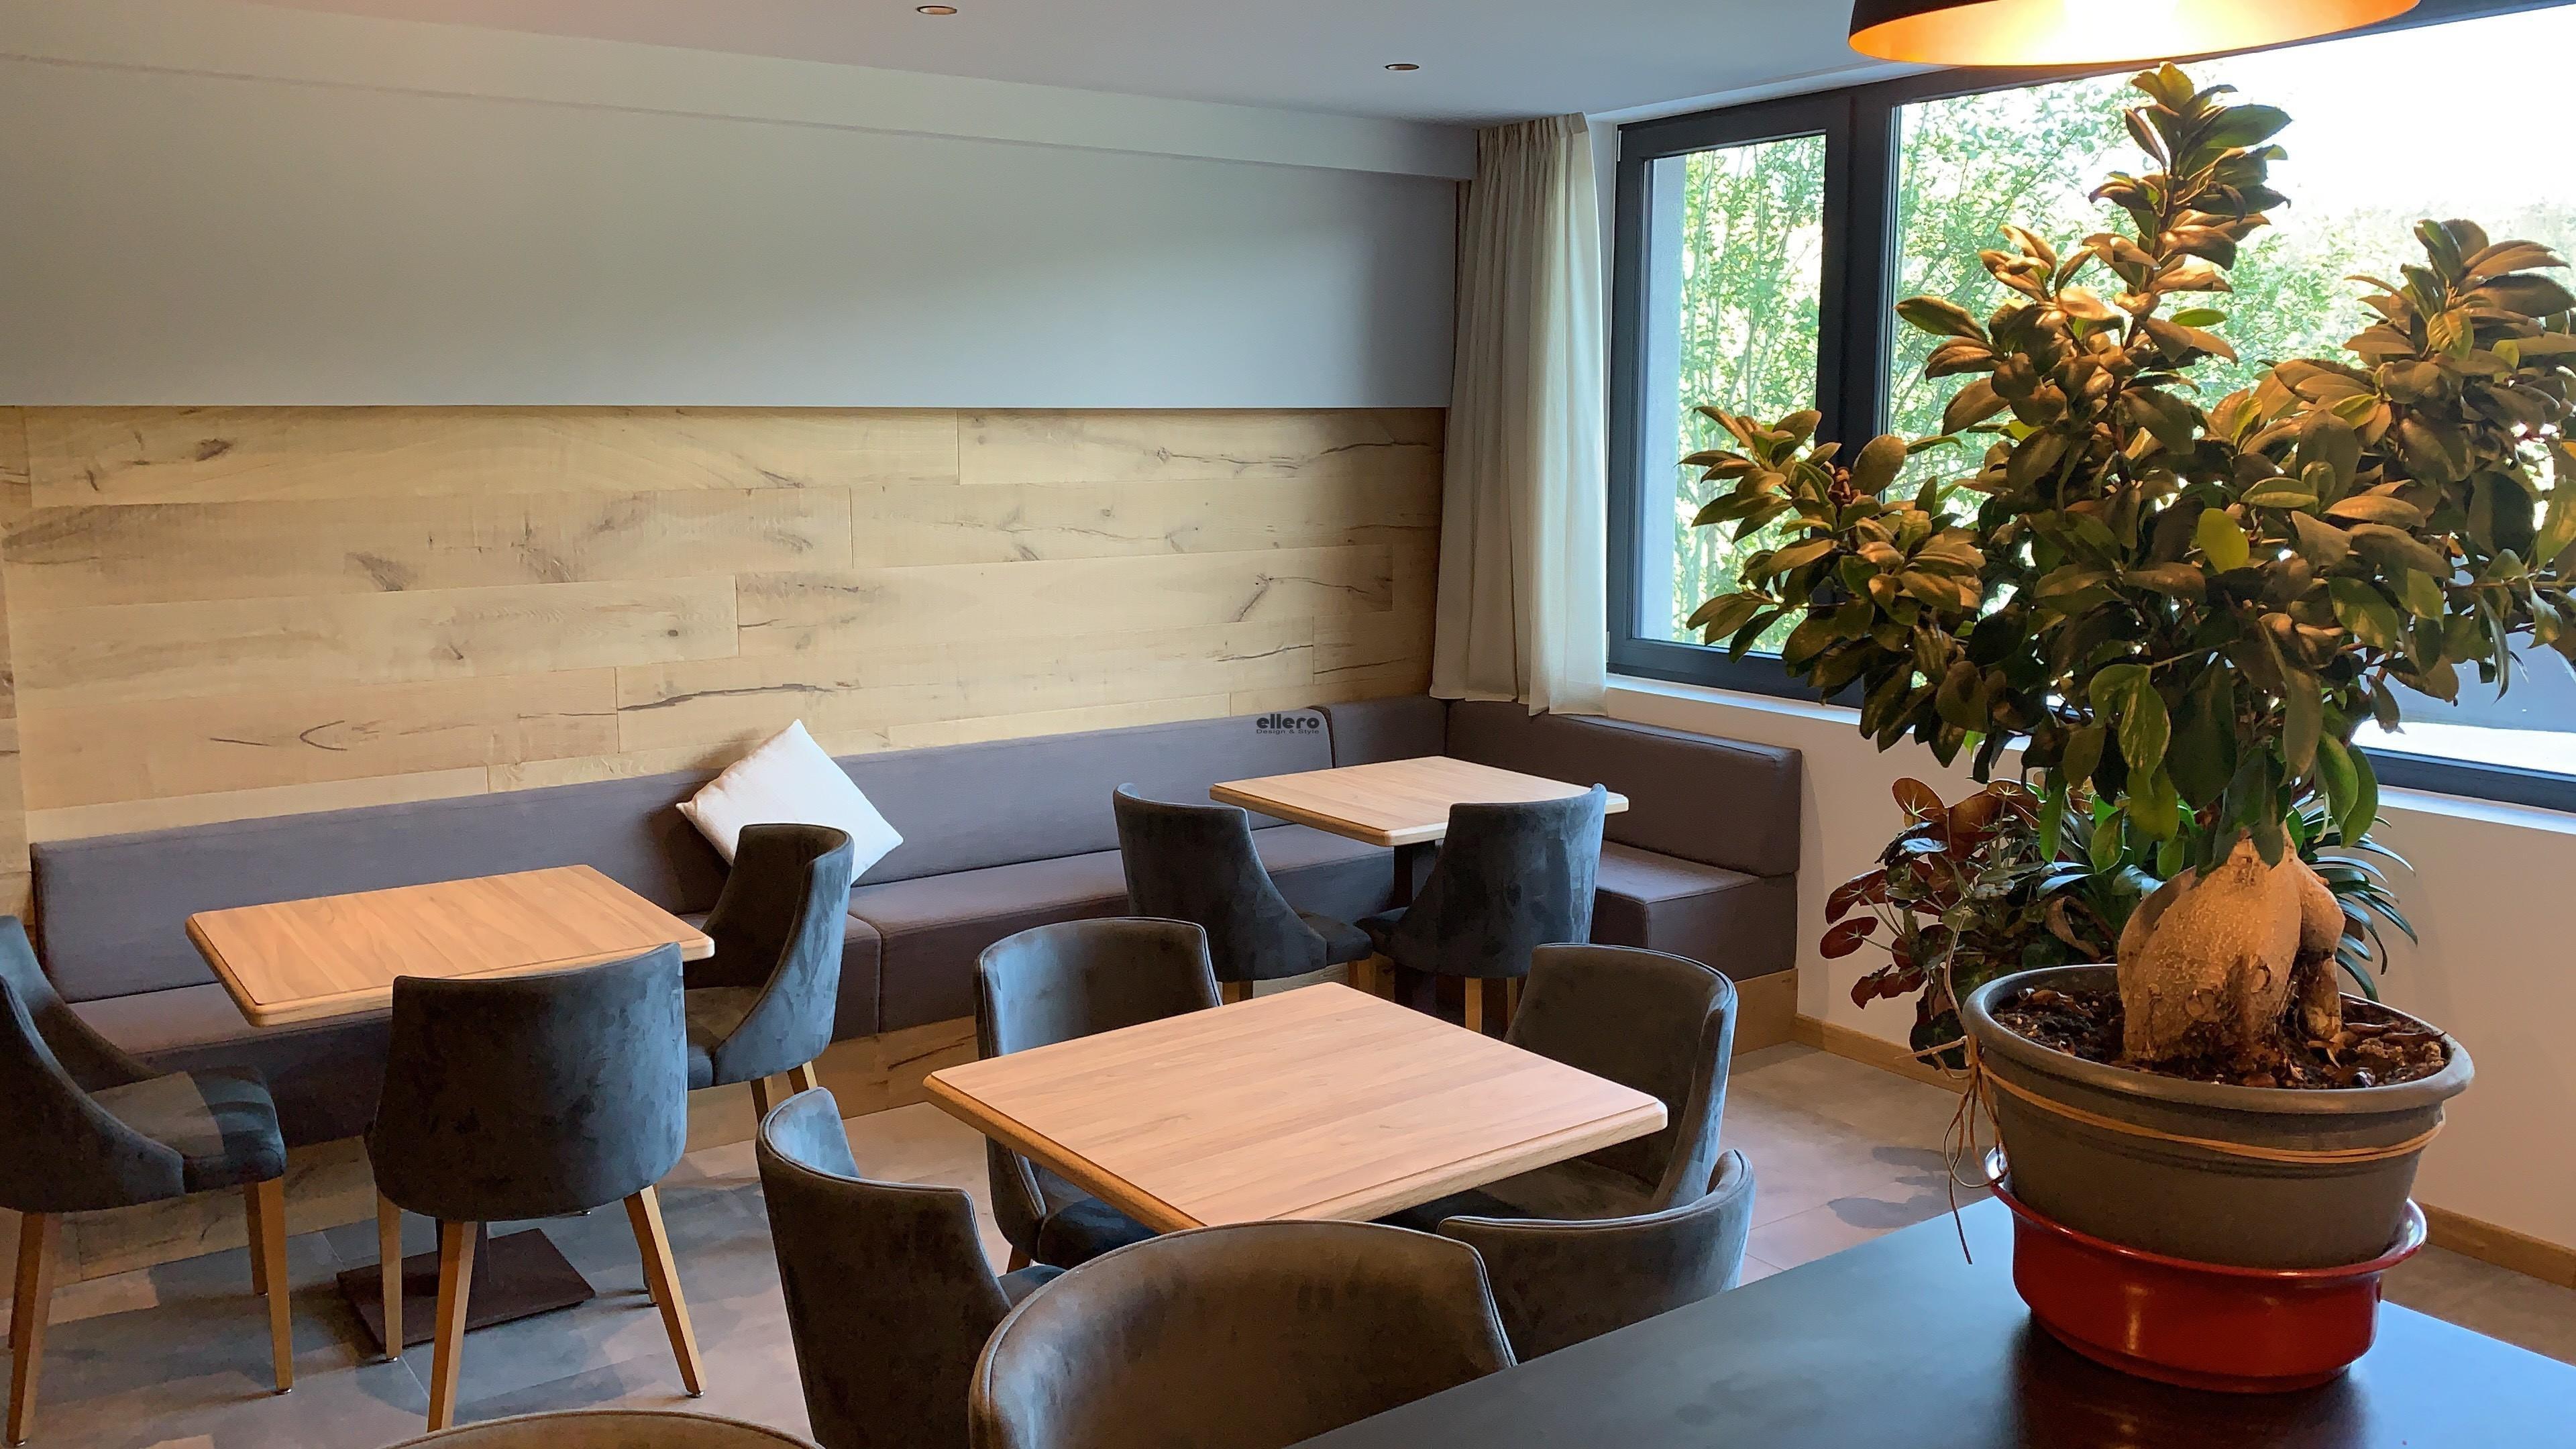 Hotel_Al_Lago_Lavarone_Trentino_Italy_Basic_chair_and_barstool